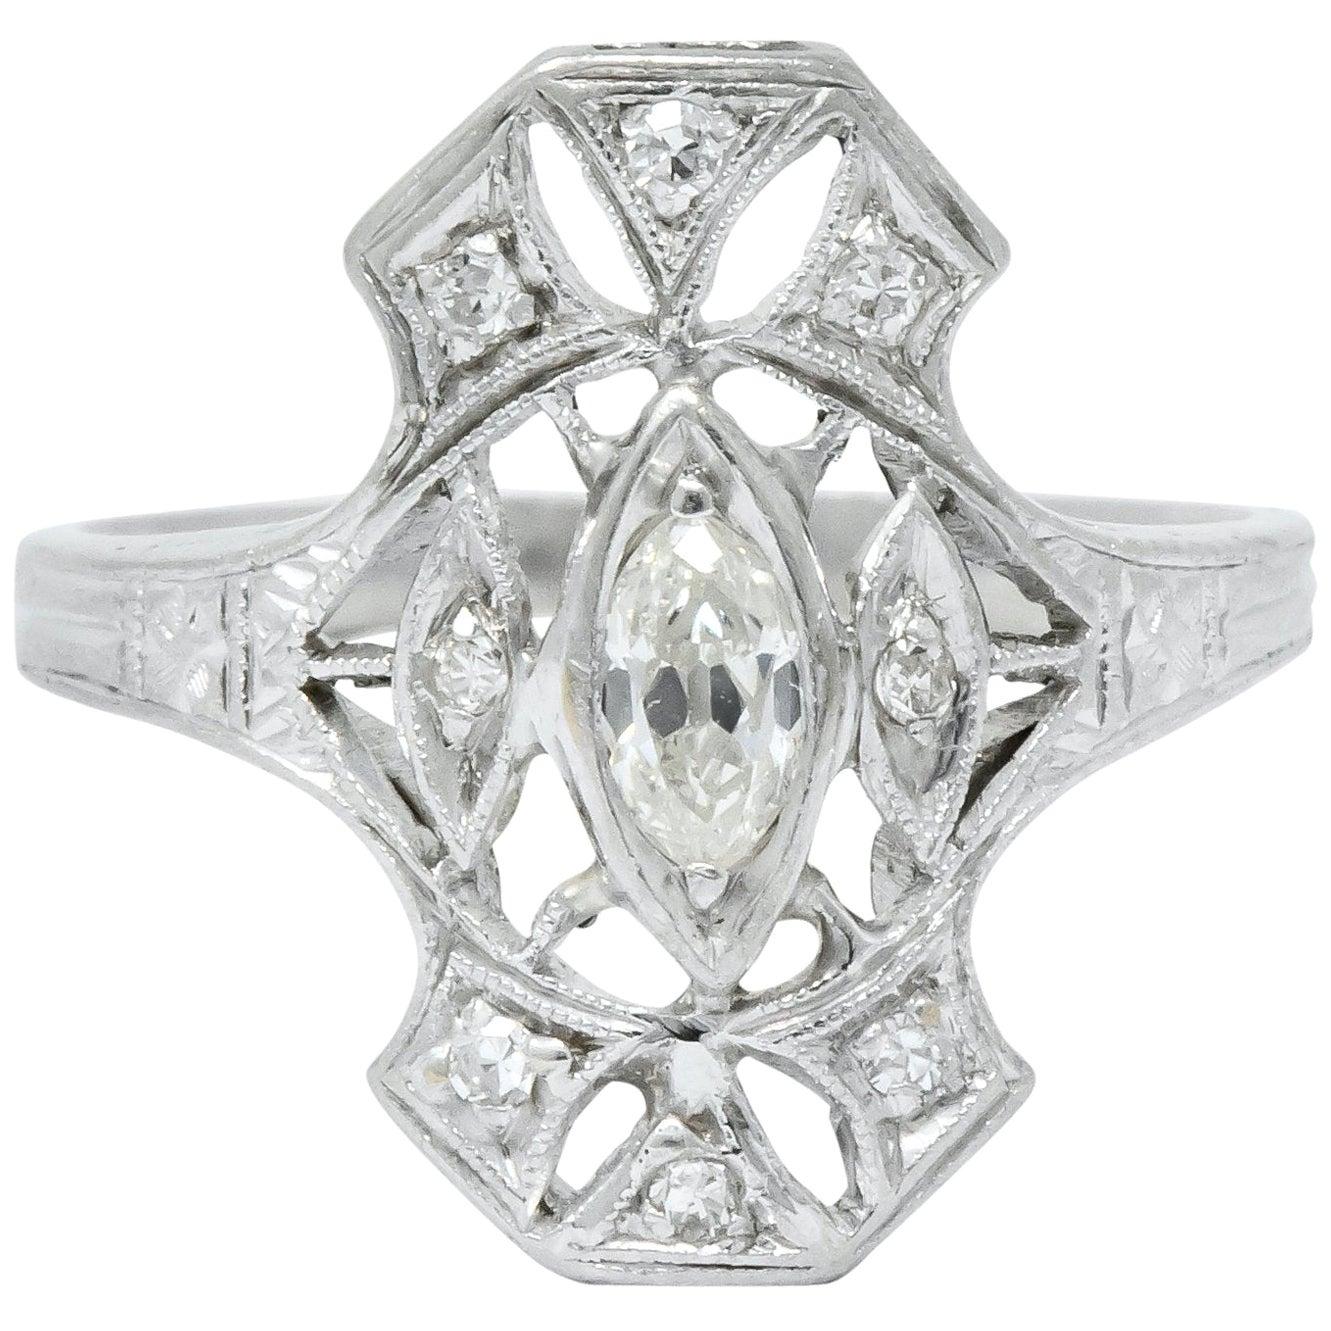 Intriguing Art Deco 0.50 Carat Diamond Platinum Dinner Ring